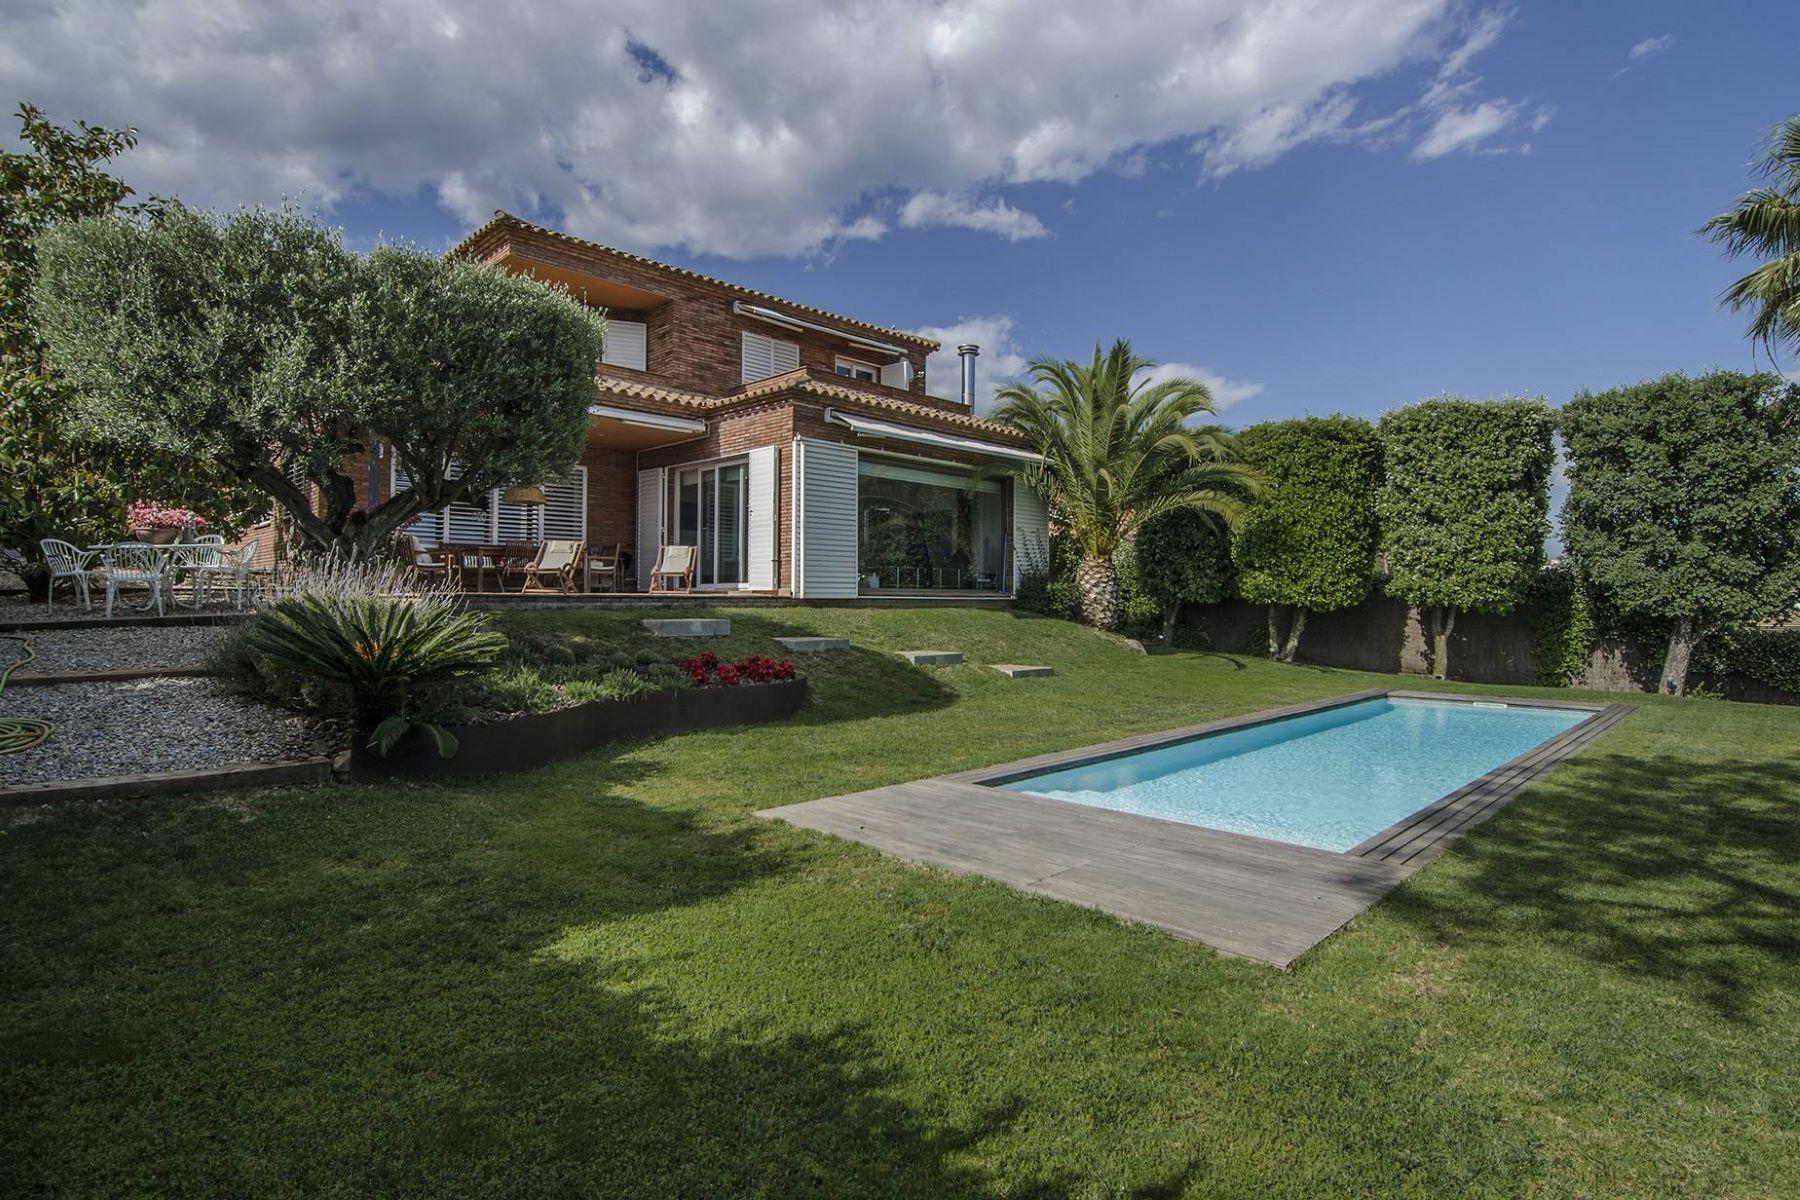 独户住宅 为 销售 在 House in Teia with Impressive Views Teia, 巴塞罗那, 08329 西班牙